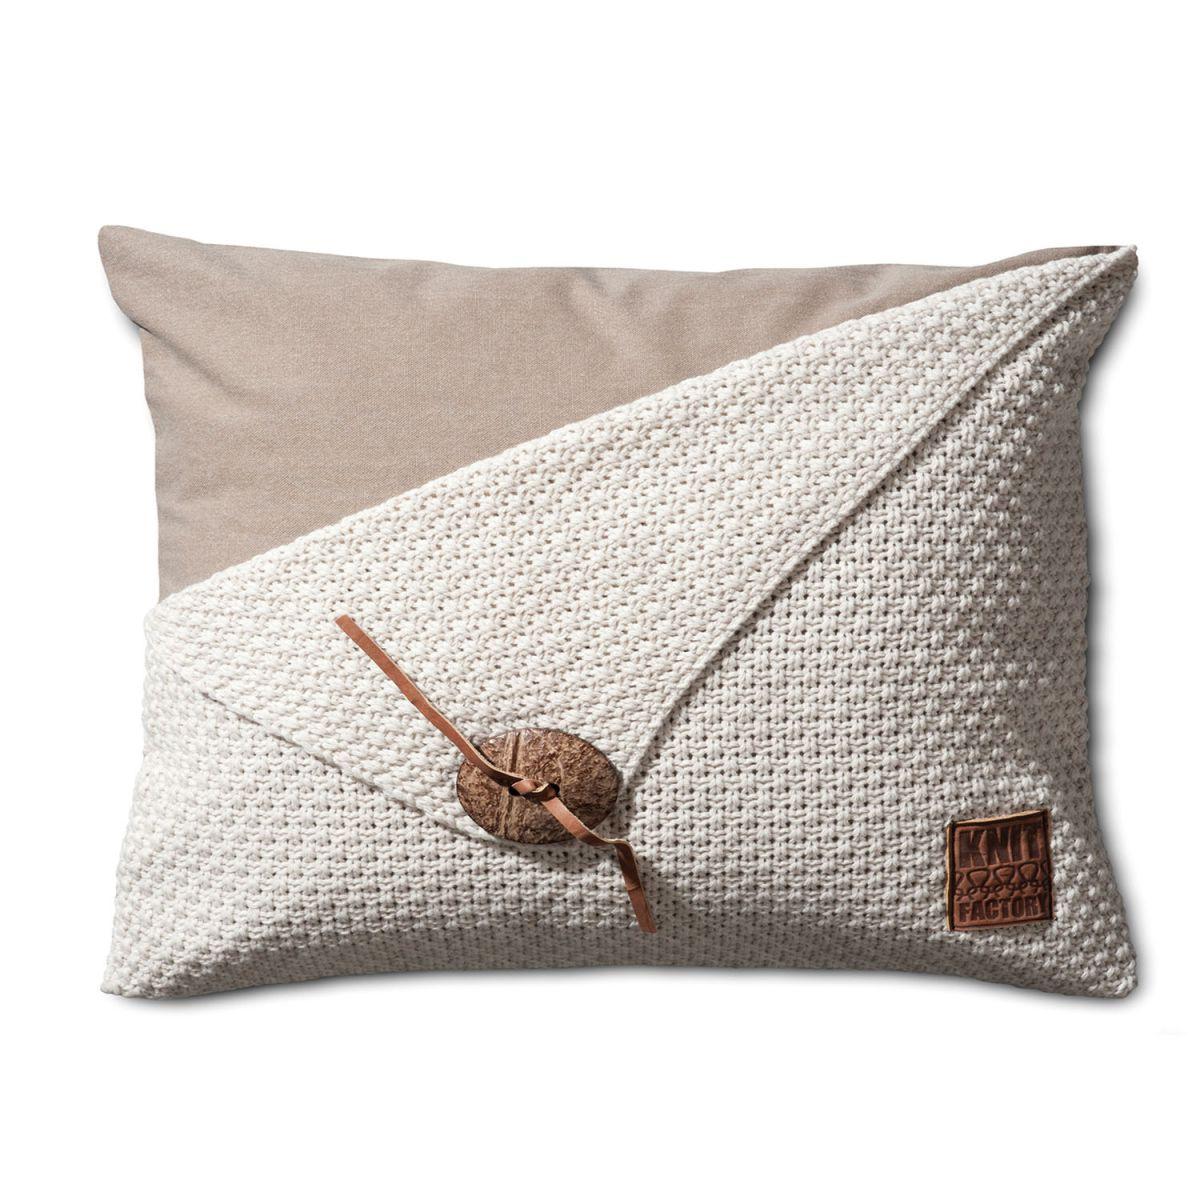 barley cushion beige 60x40